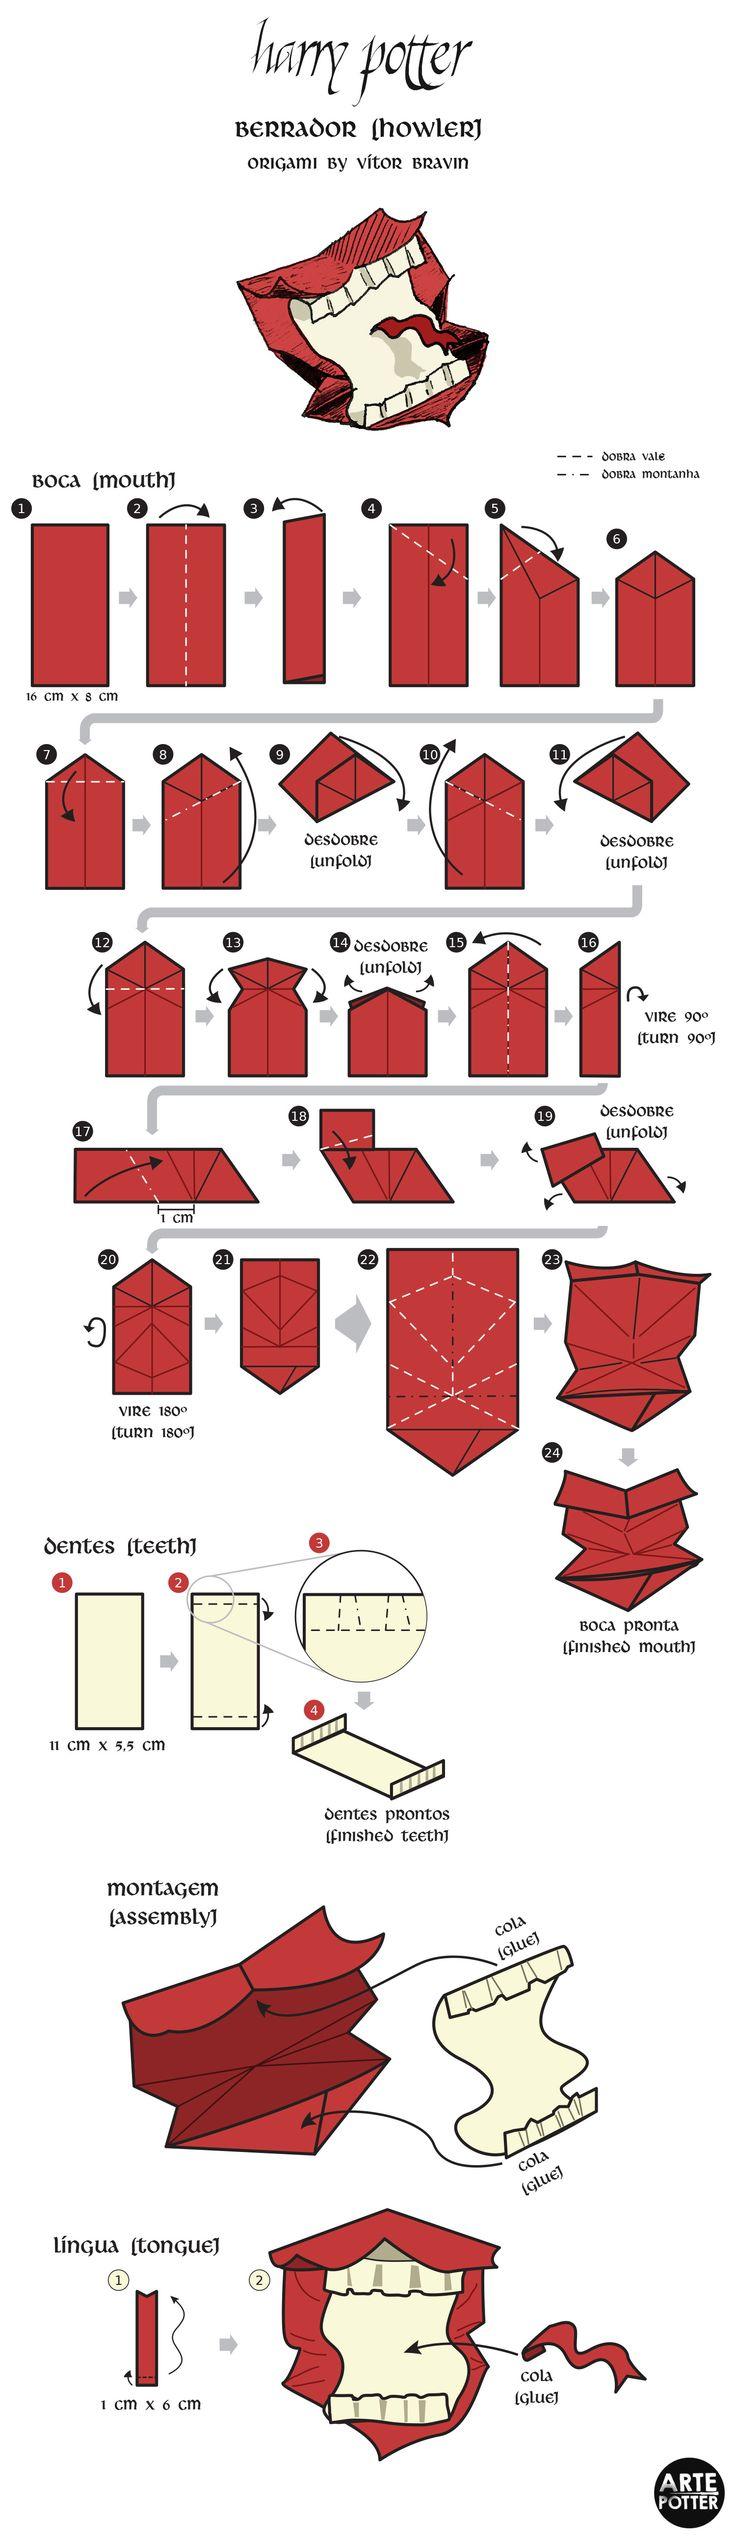 origami_design___howler_by_vitorbravin-d85anl8.jpg 1,500×5,174 pixels